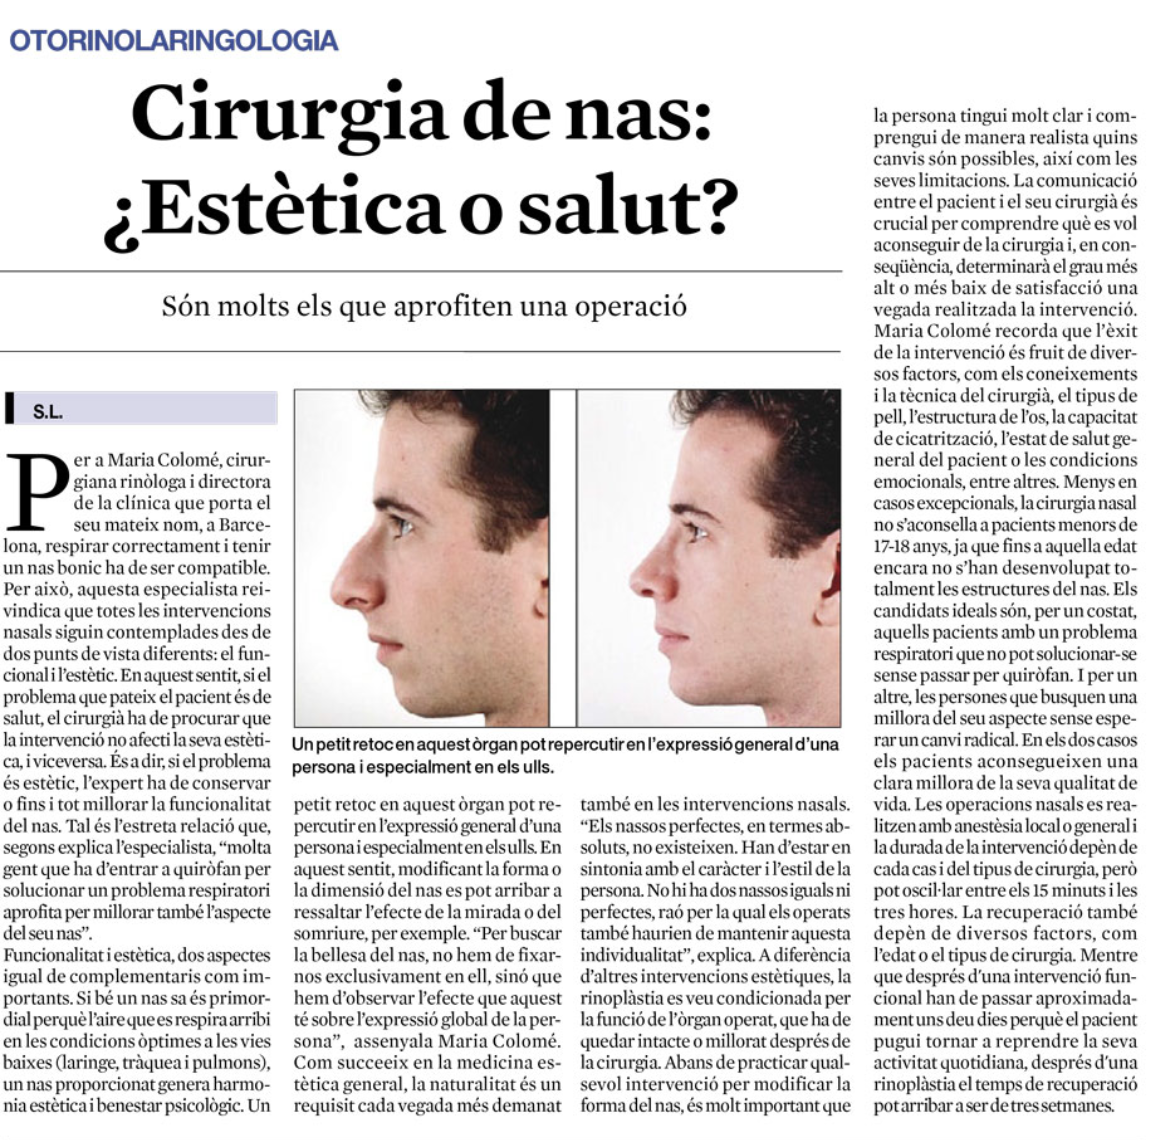 Clínica Rinològica Maria Colomé - Notícies